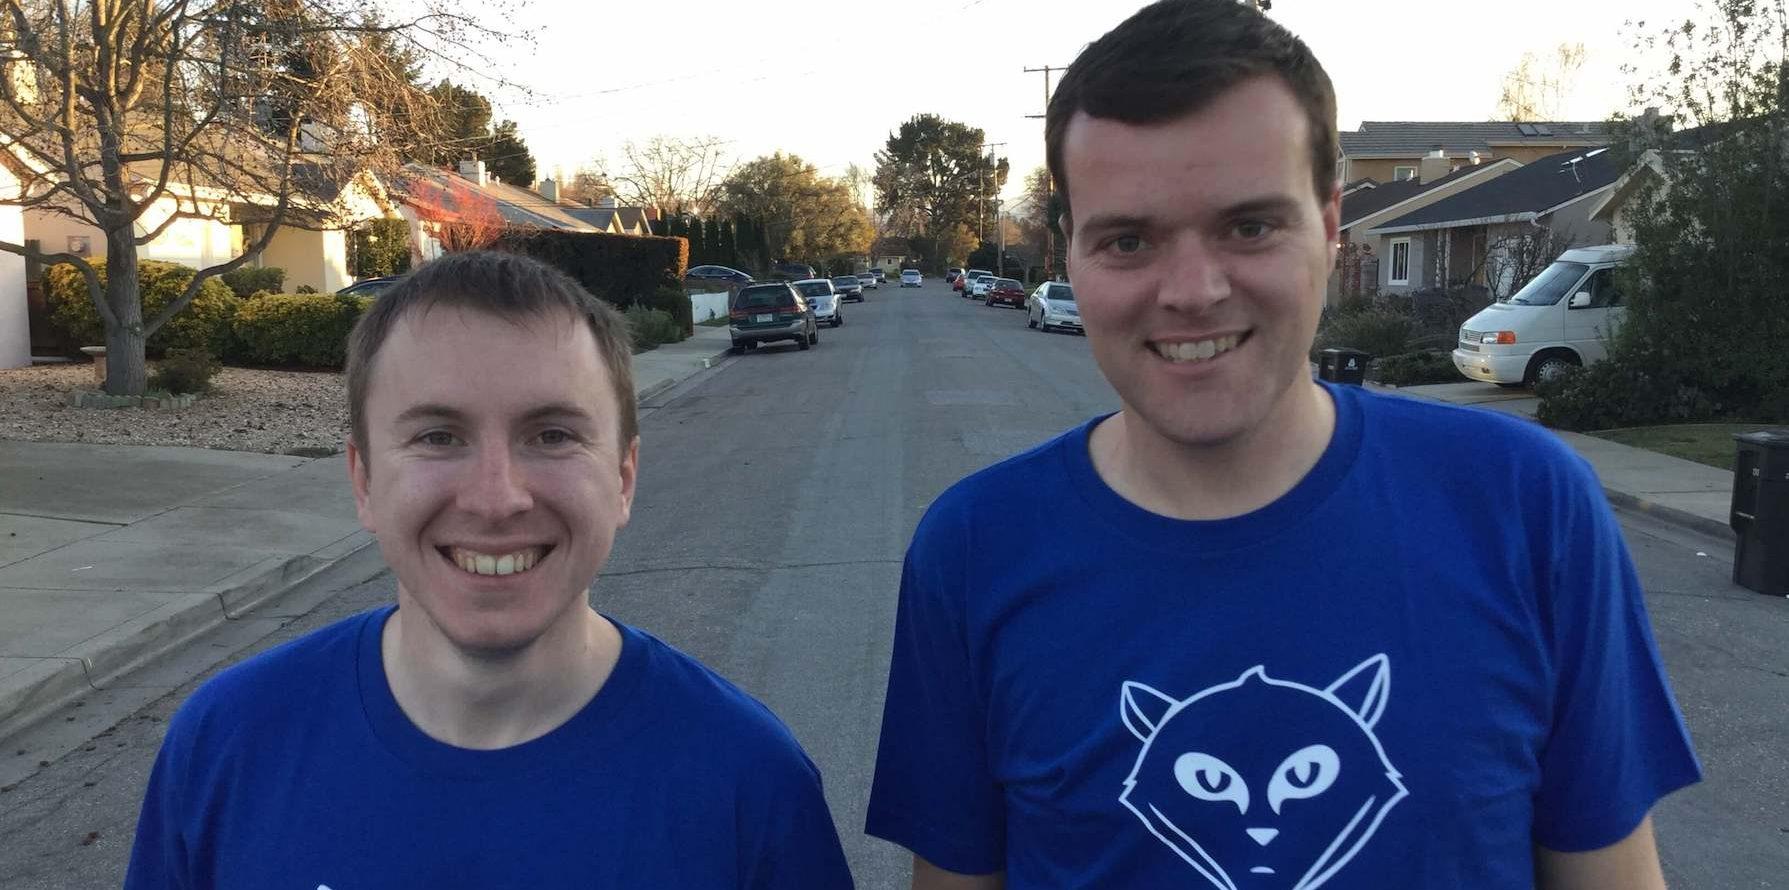 GitLab raises $20M Series C, adds Matt Mullenweg to board